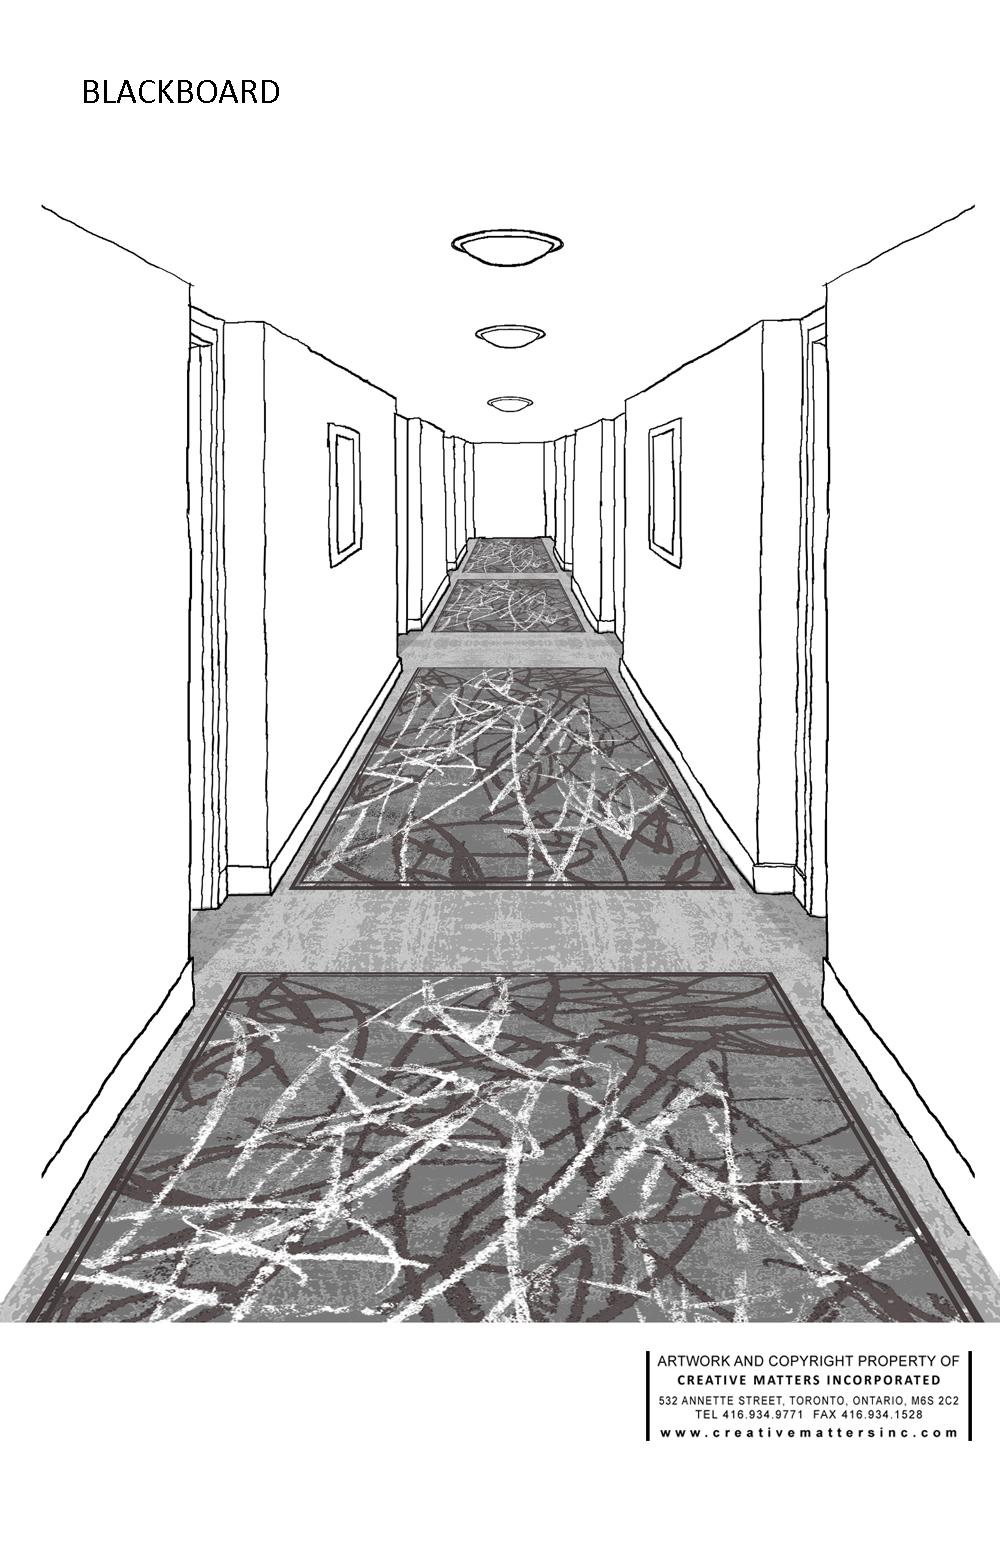 URBAN COLLECTION - BLACKBOARD BY CMI DESIGNER CAROL SEBERT